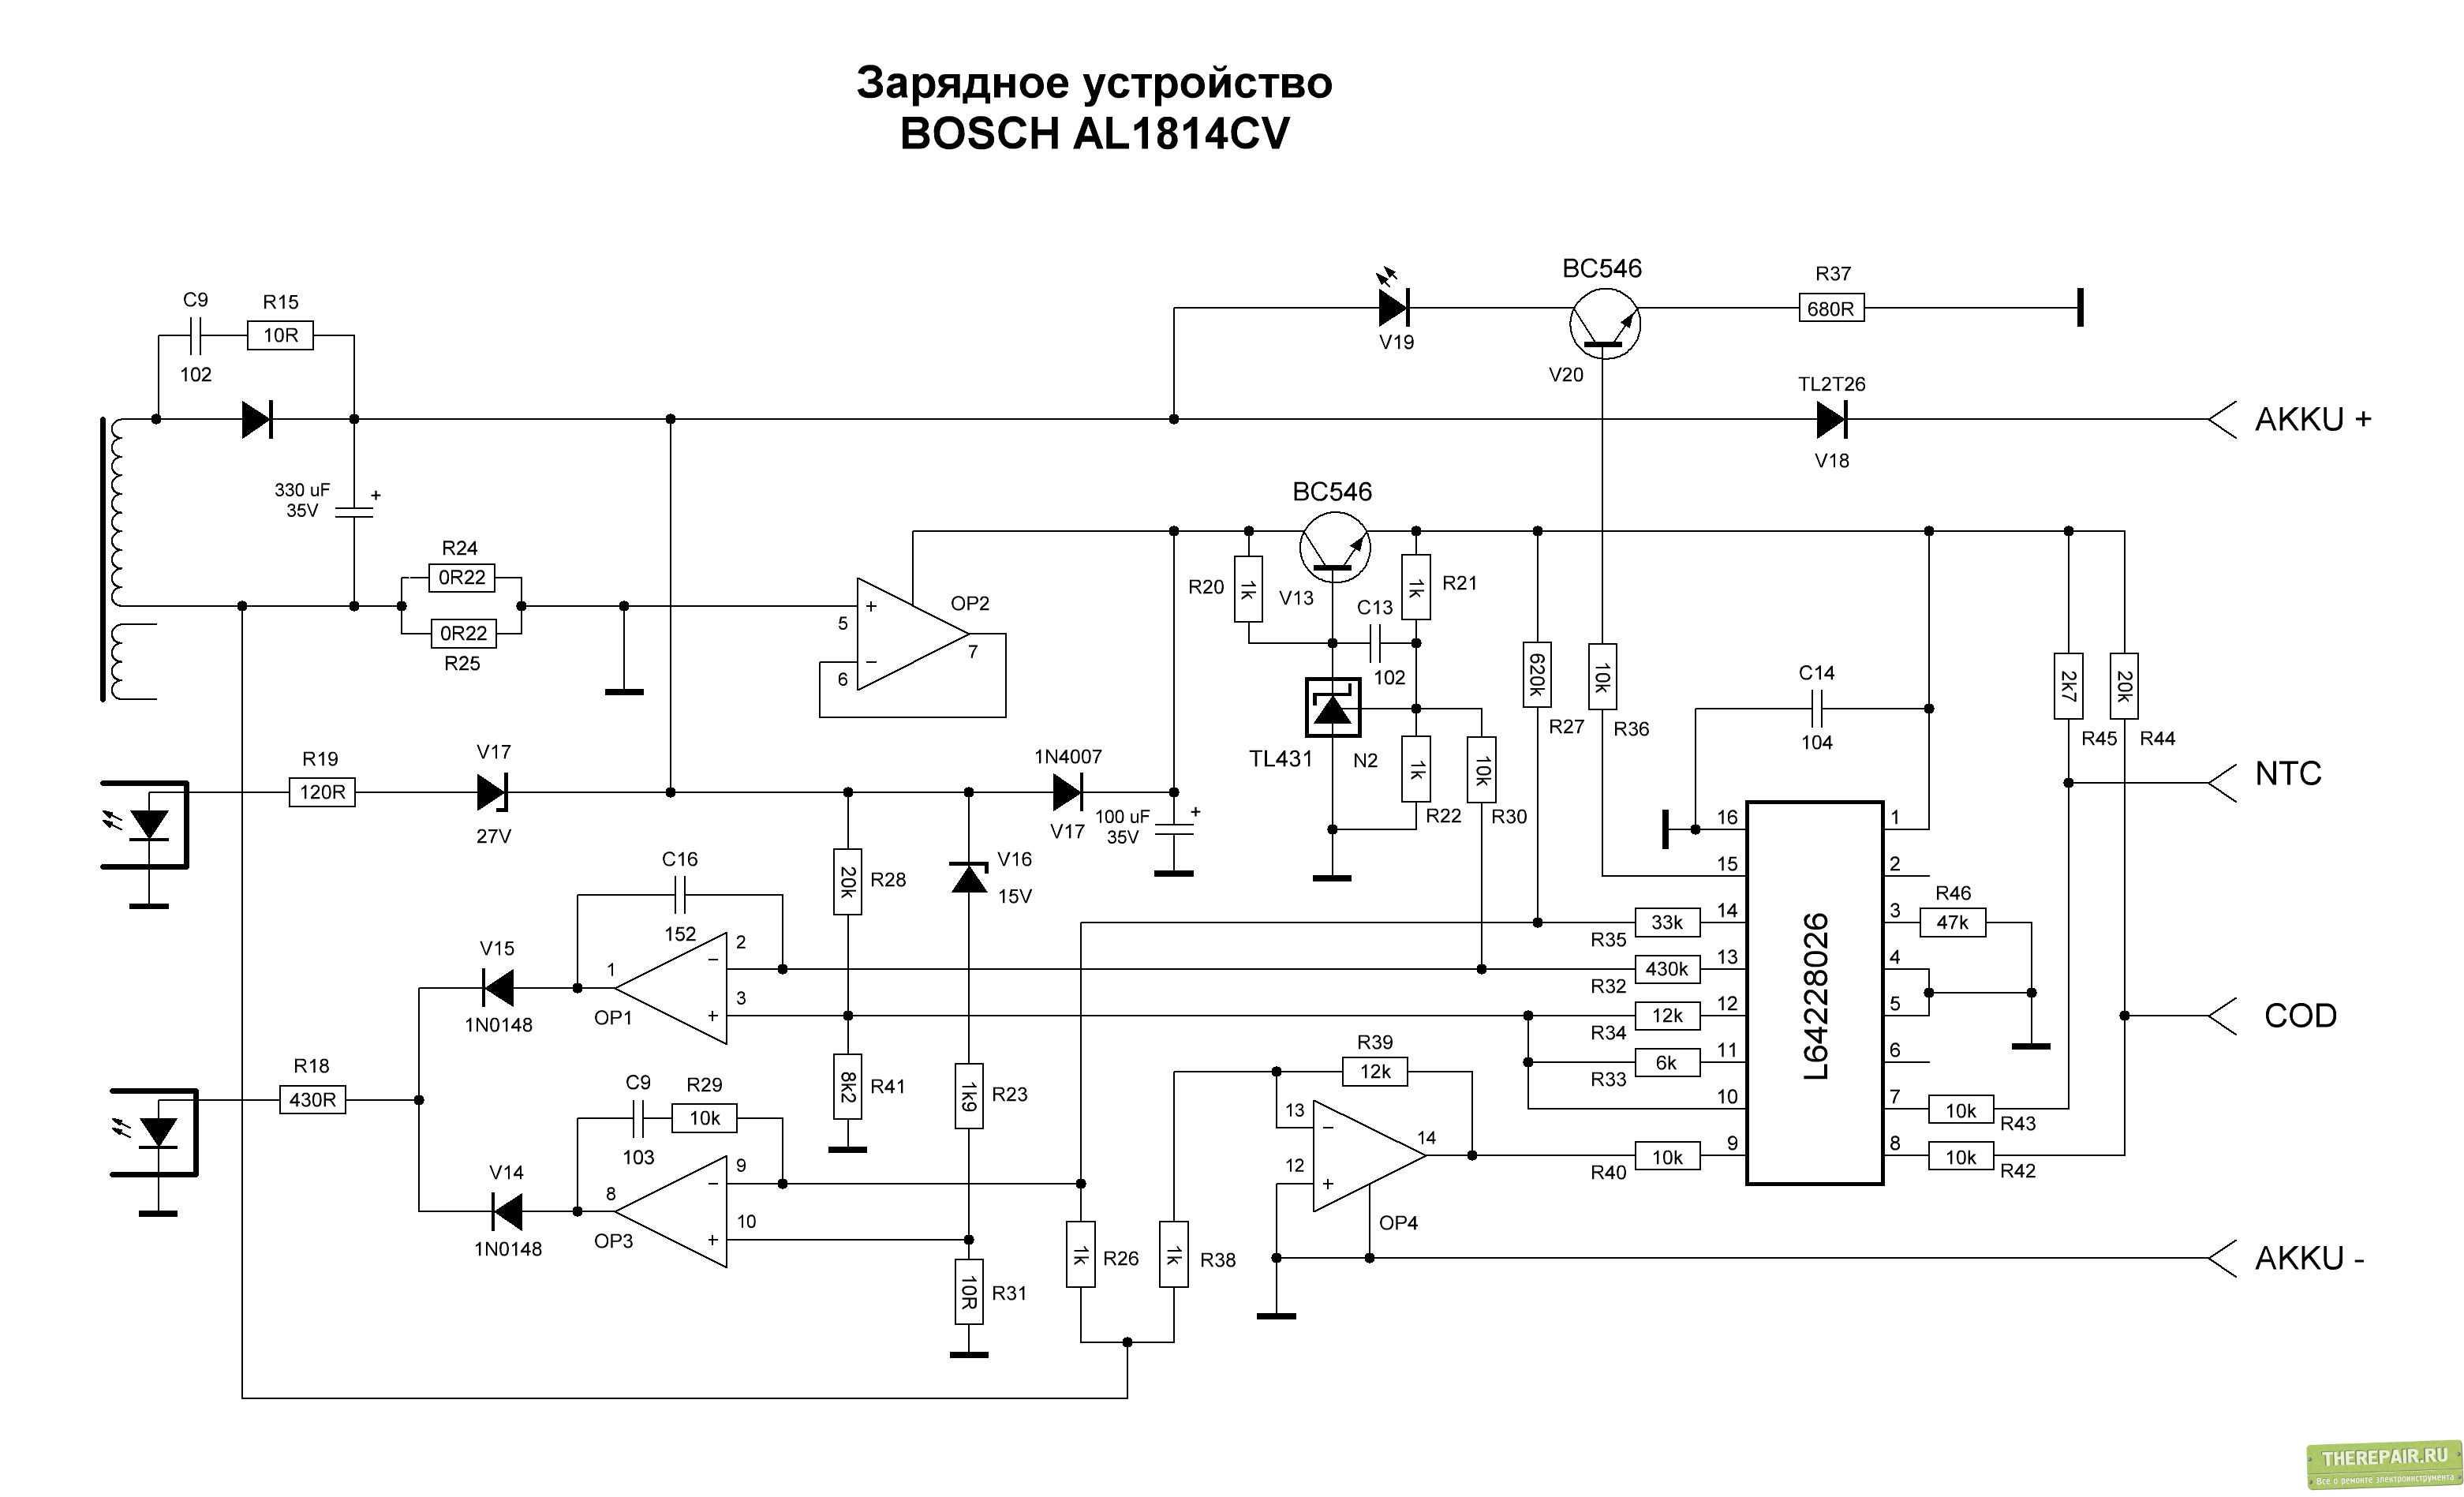 Bosch схема зарядного устройства фото 376